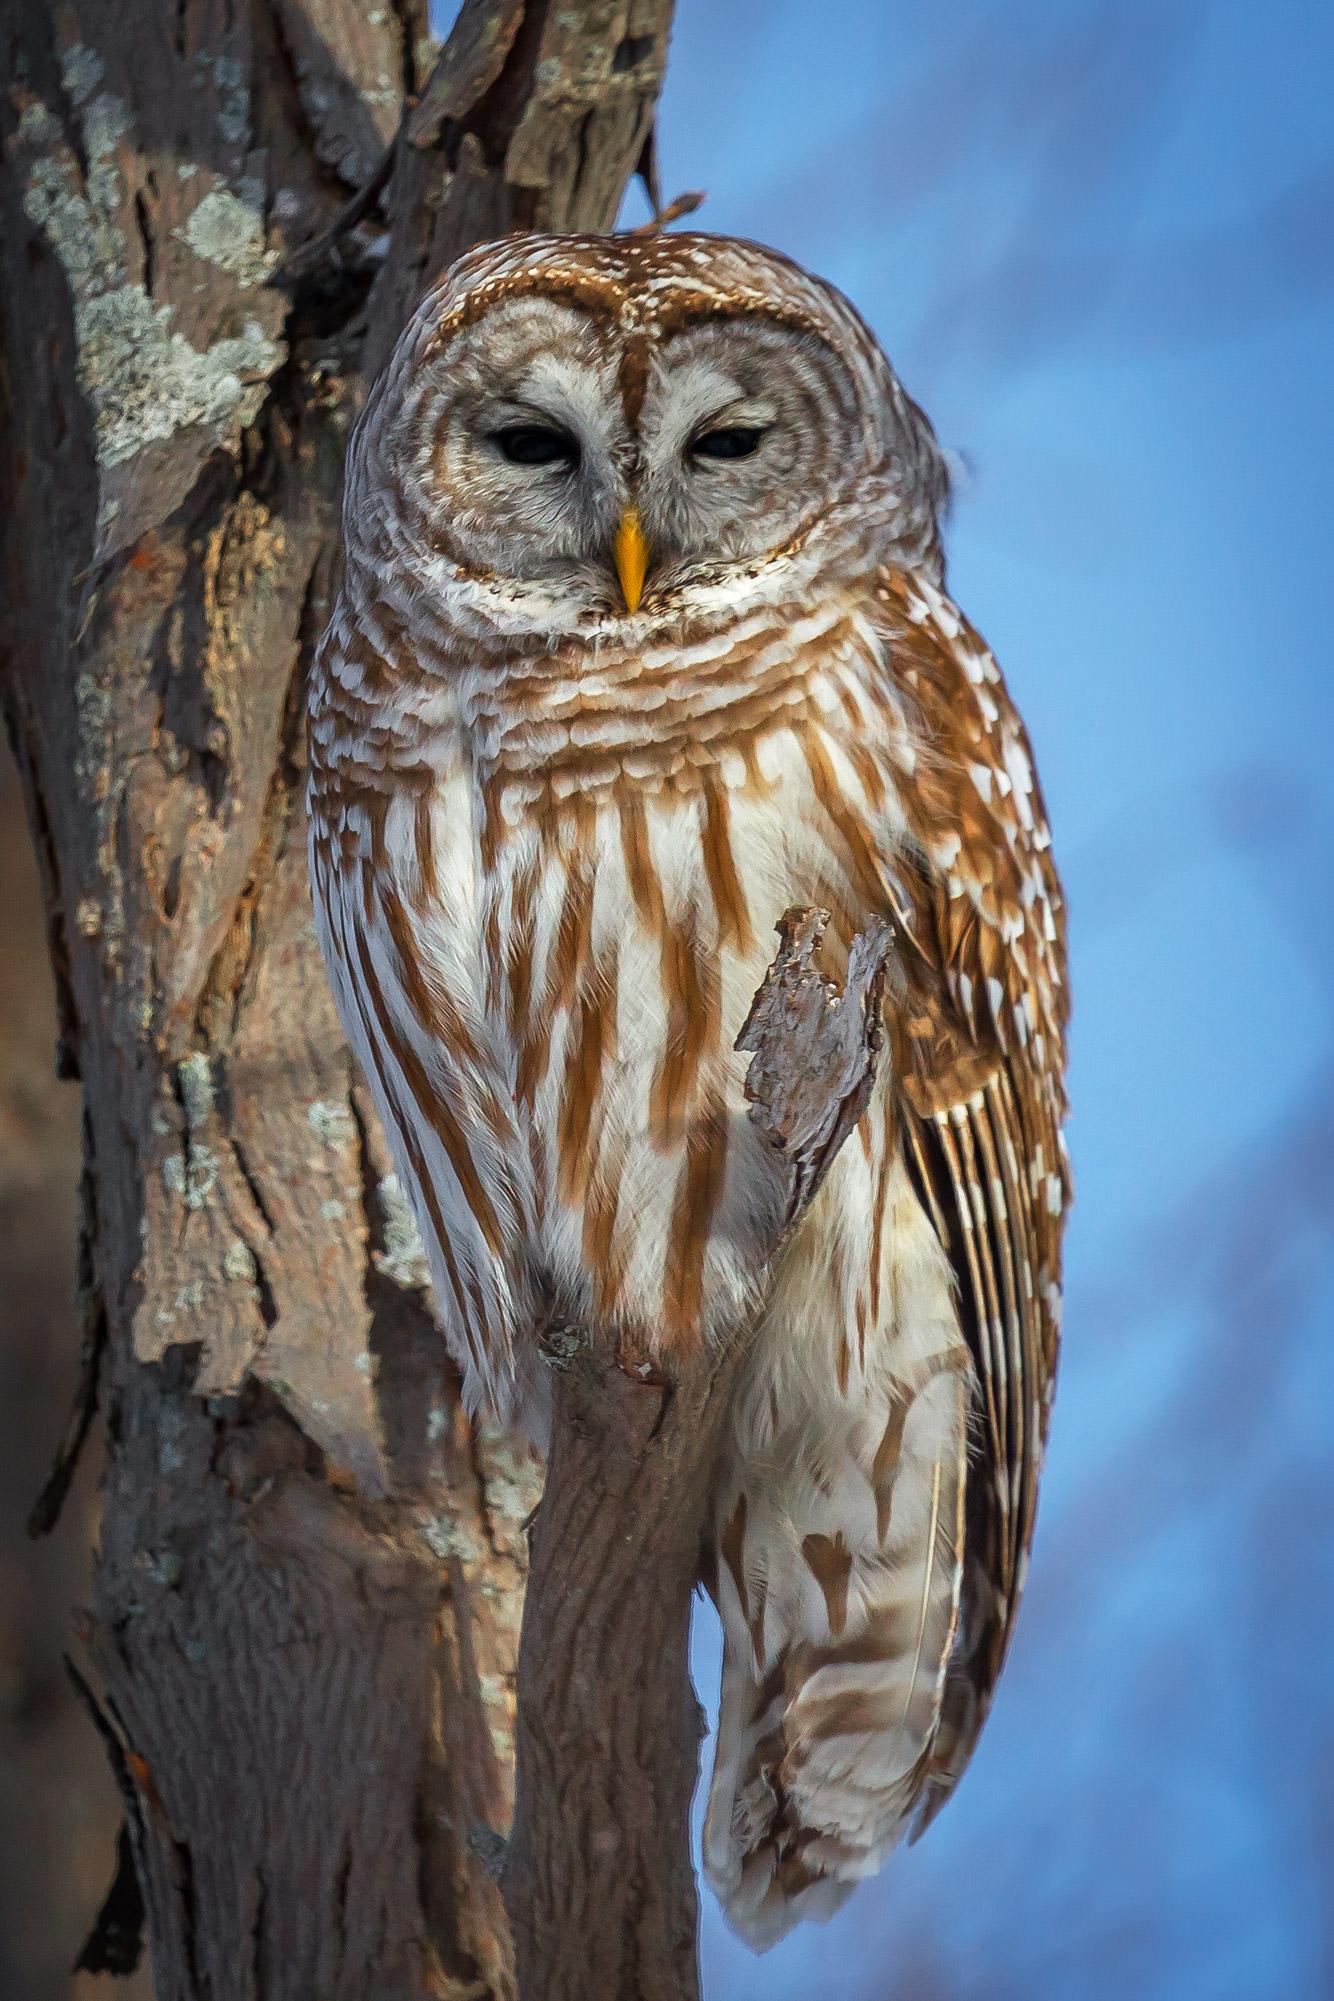 Owl, Barred Owl, Canada, photo